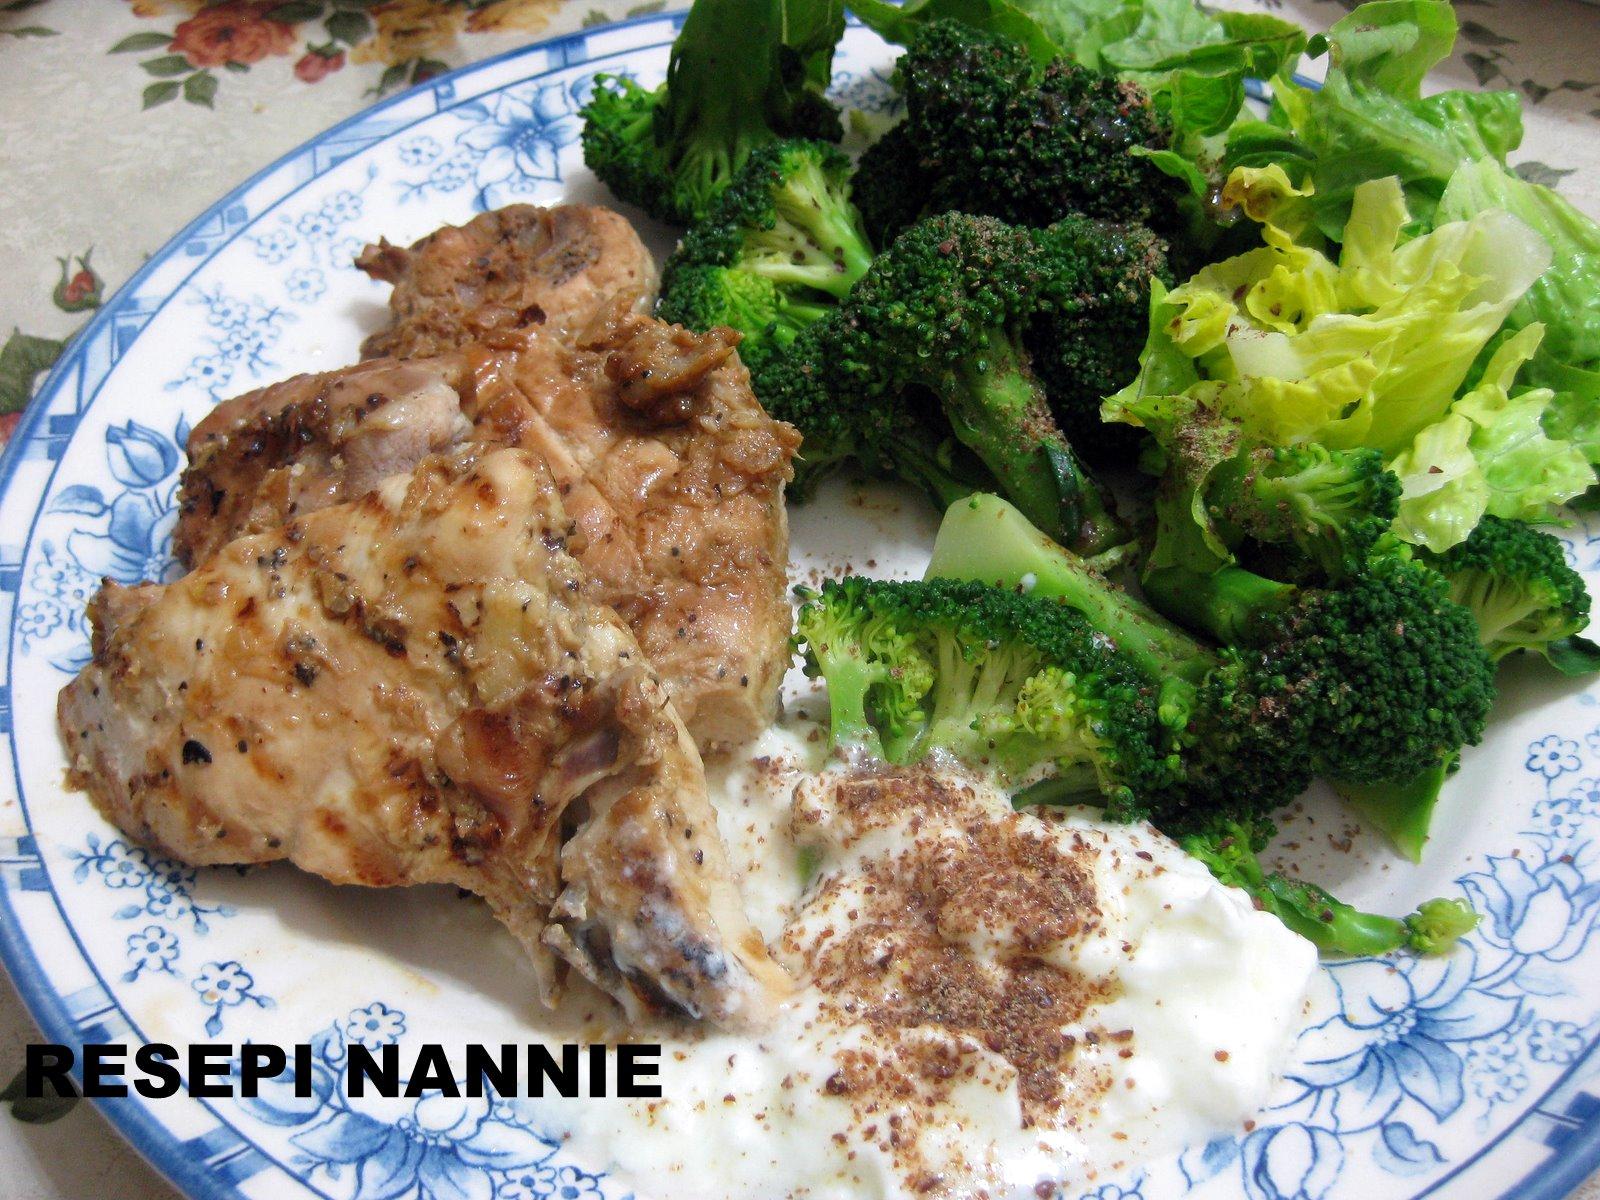 RESEPI NANNIE: Ayam grill & brokoli